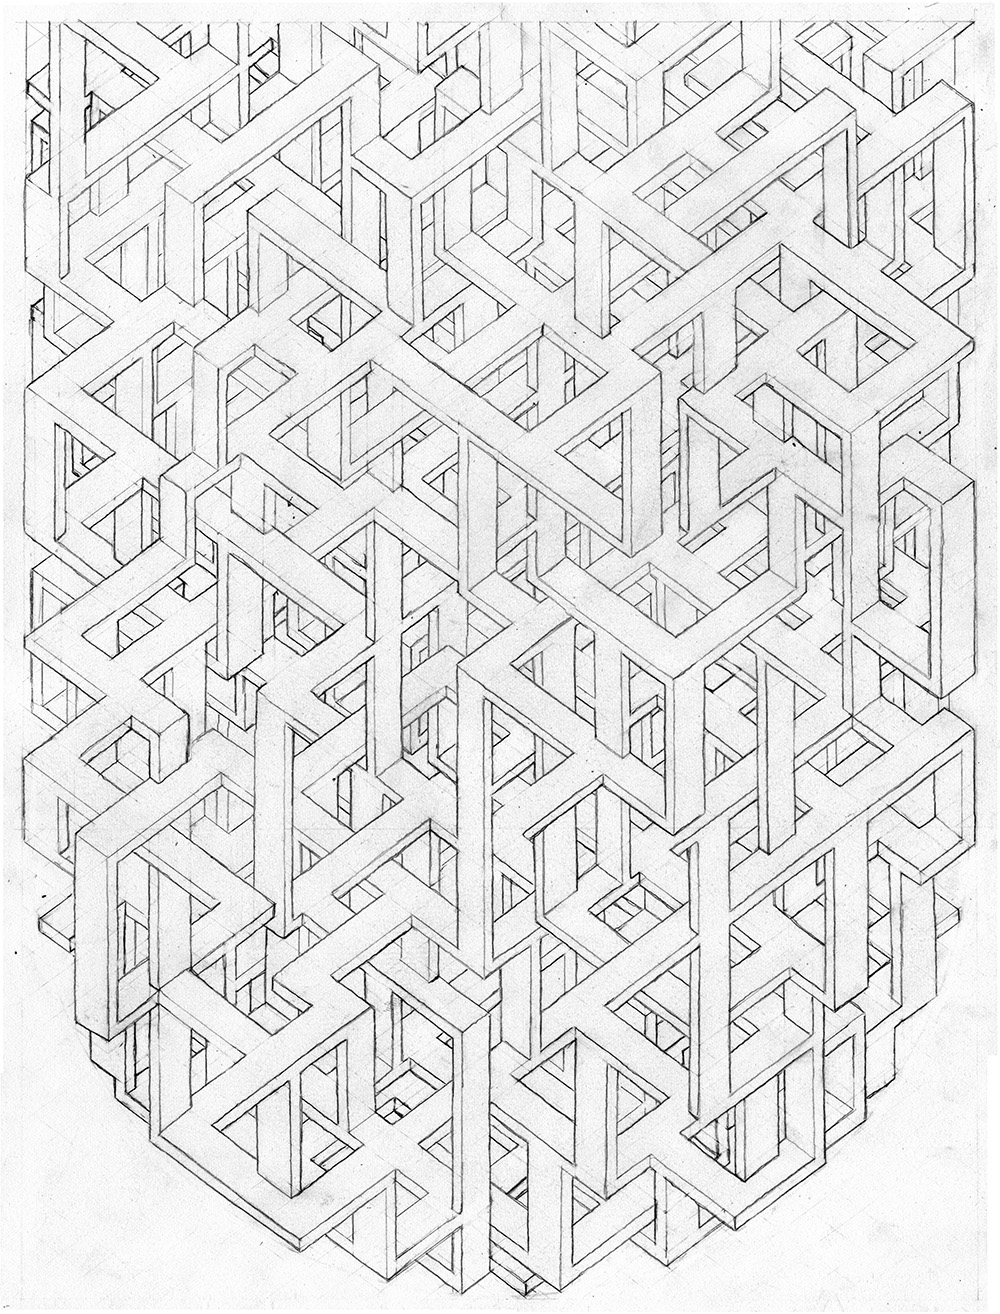 penrose-drip-graphite.jpg